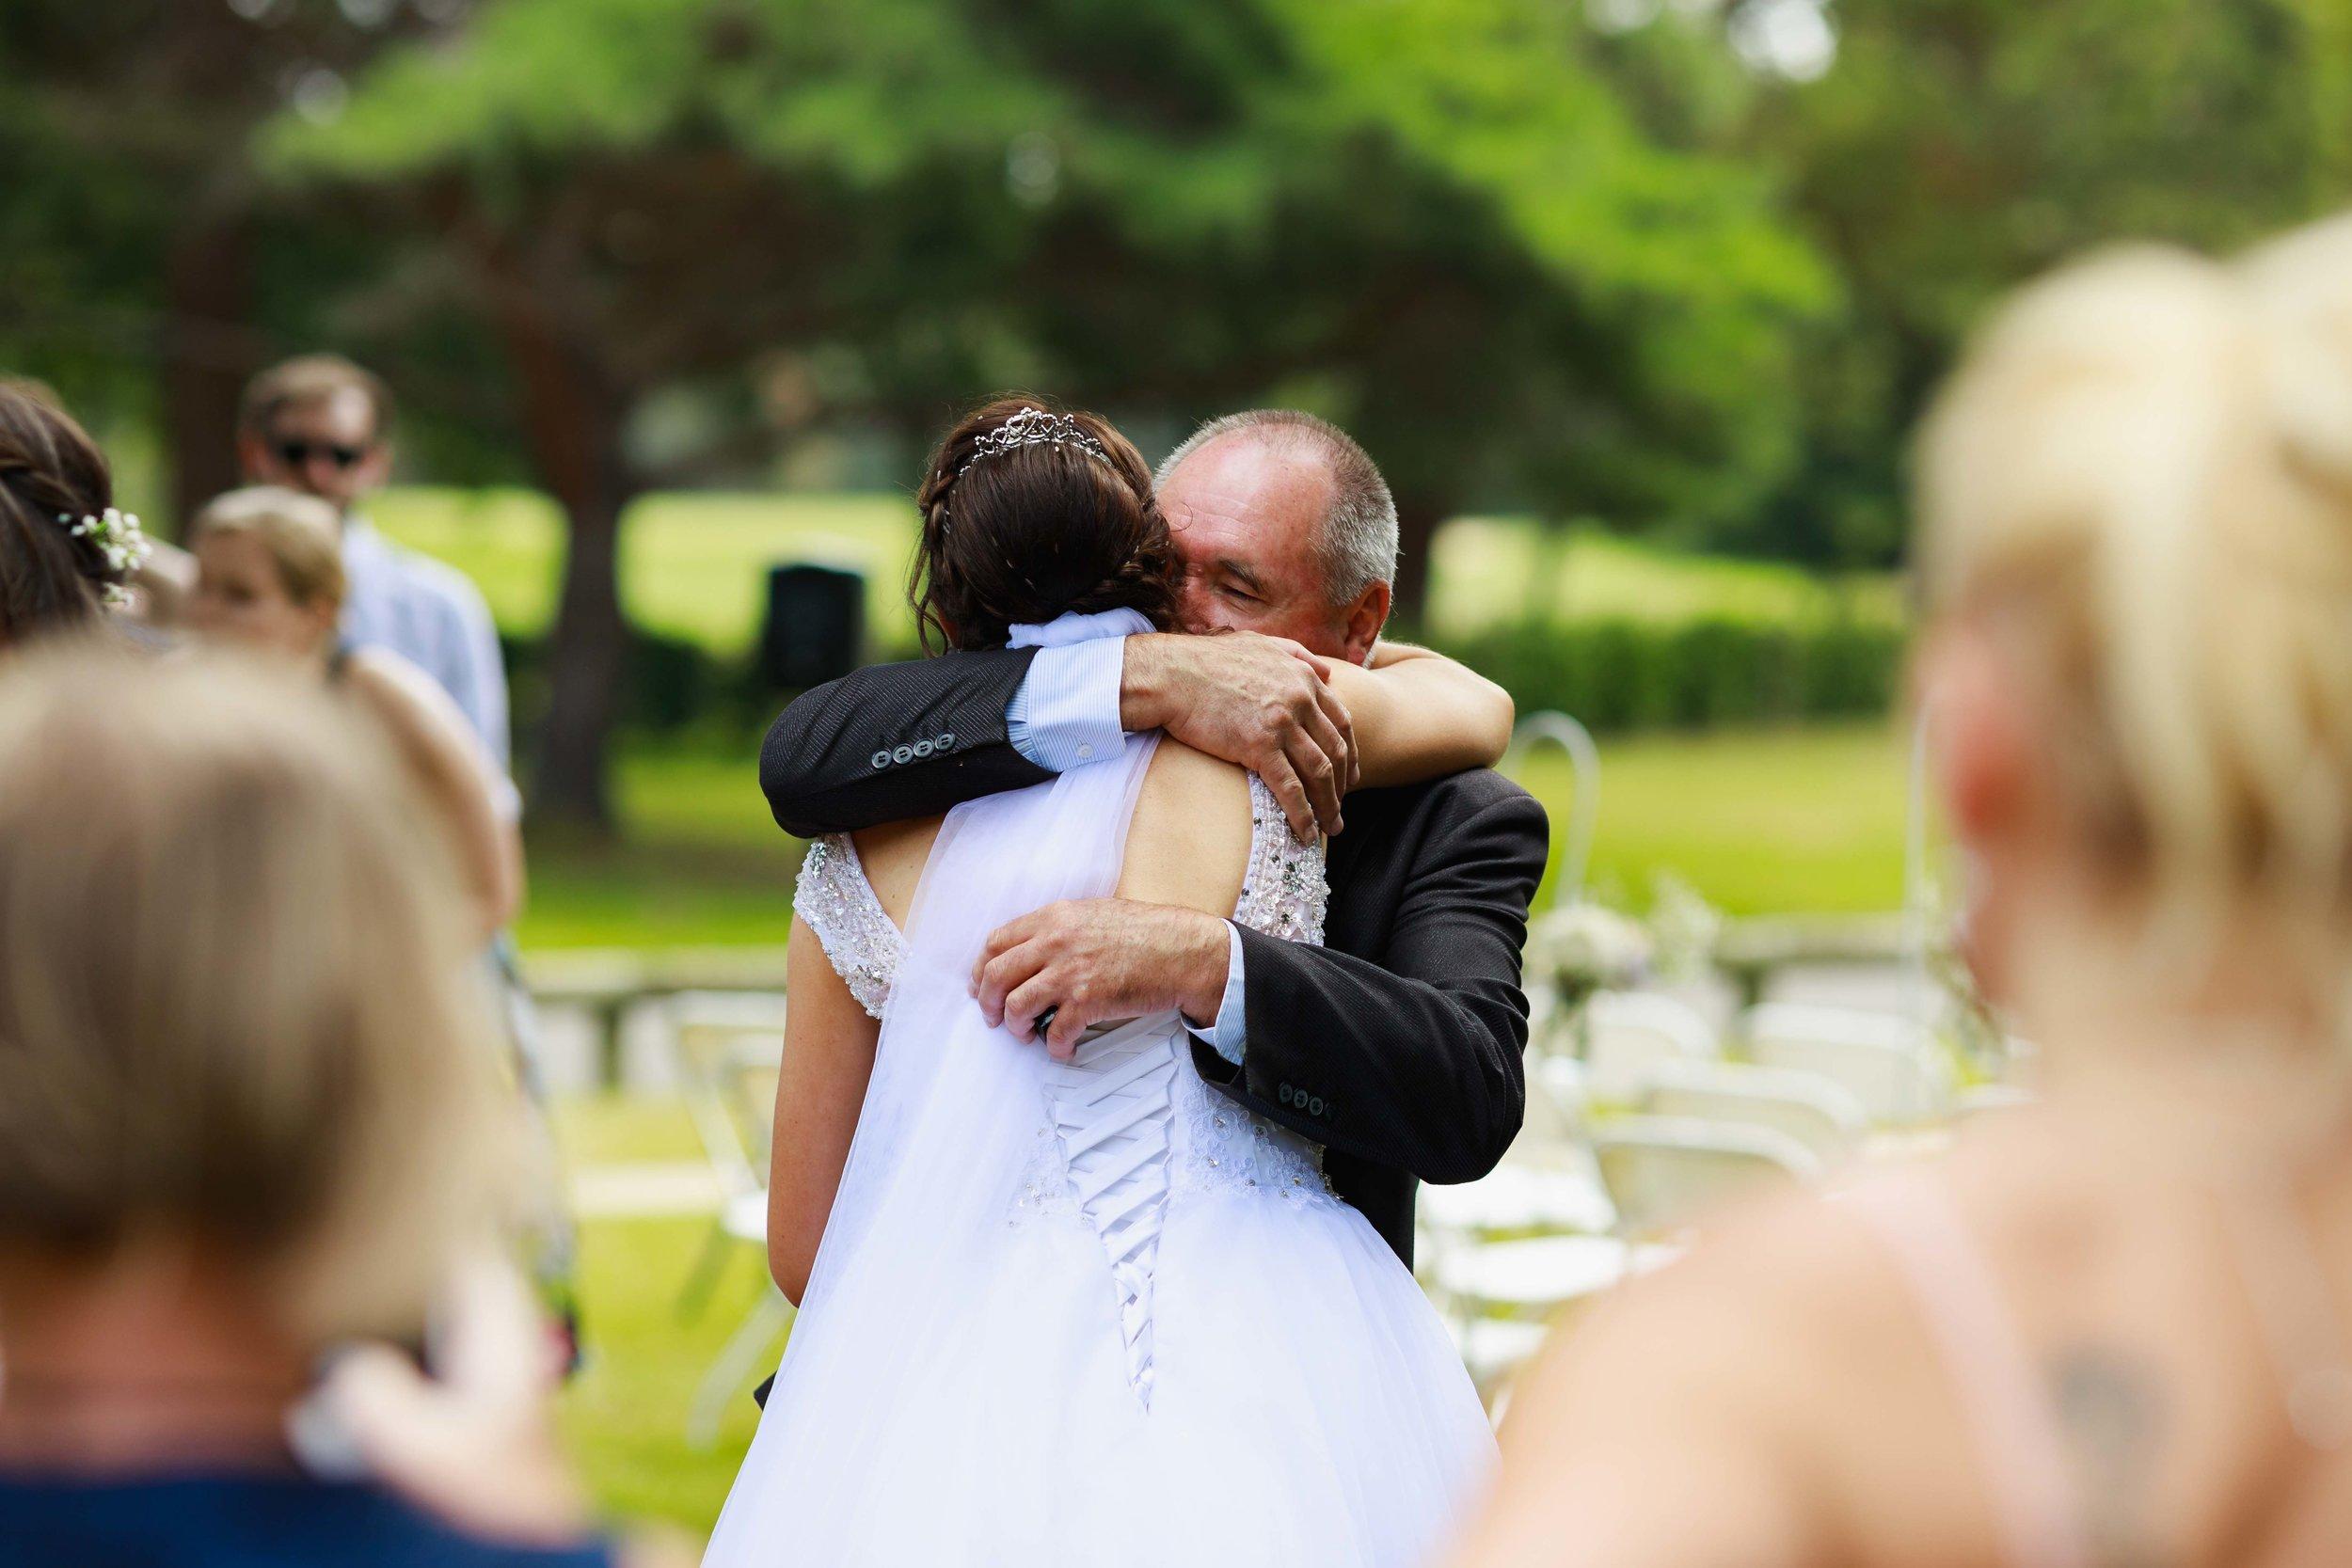 the-chalet-highlight-wedding-photography-palmerston-north-86.jpg